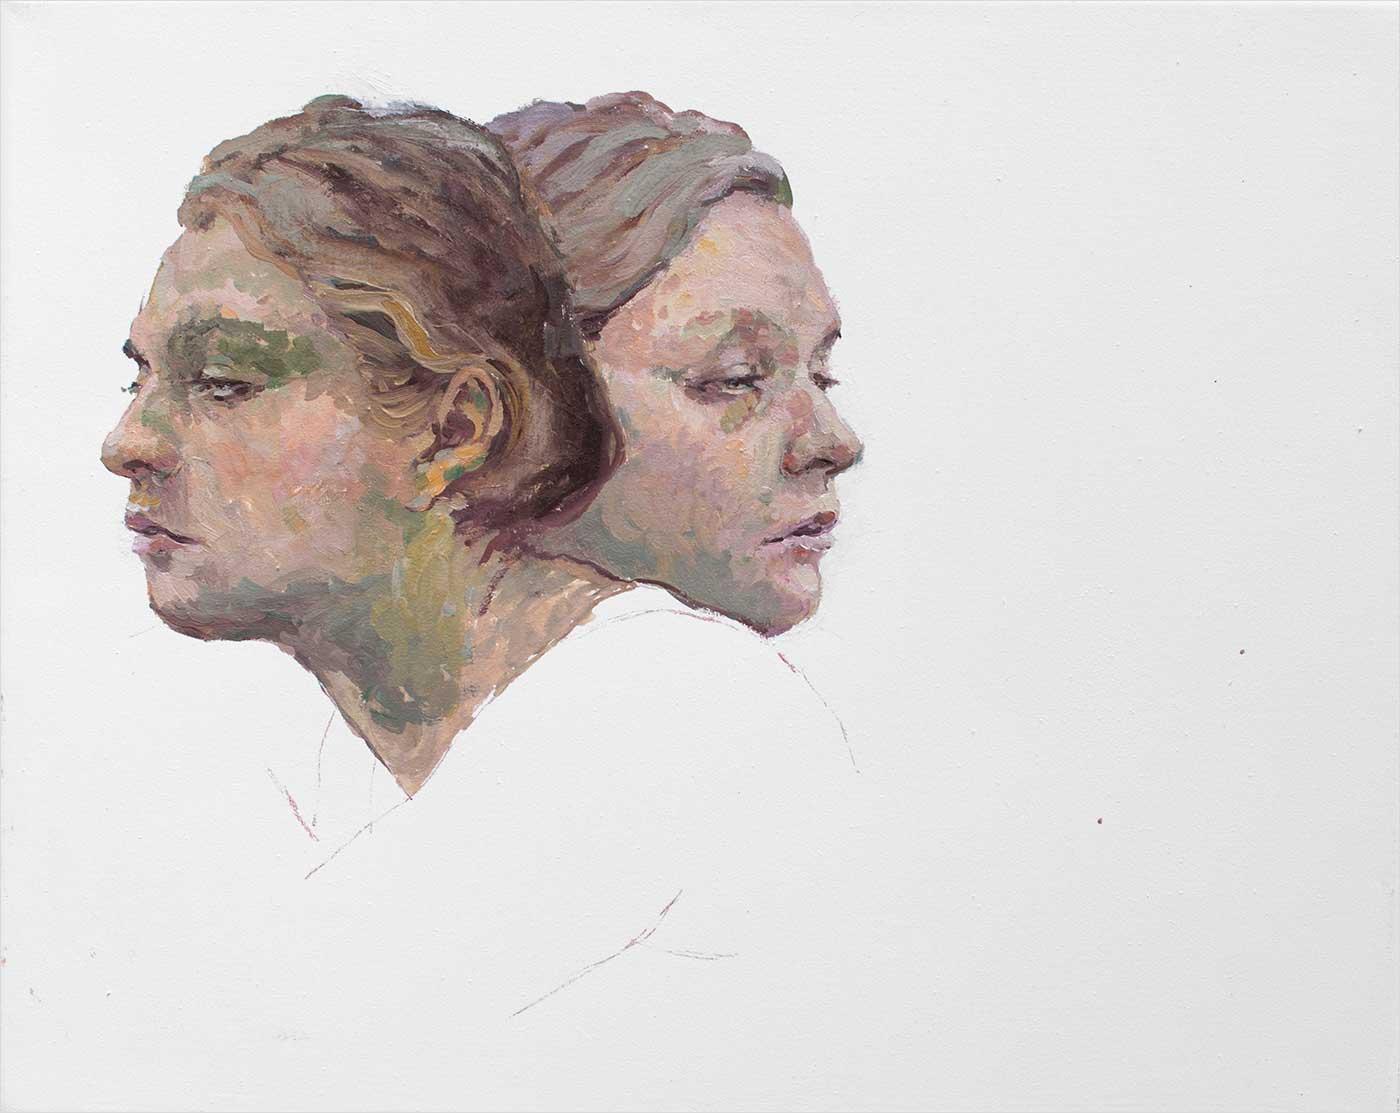 Janus2 50 x 40cm, Öl Lwd, 2018